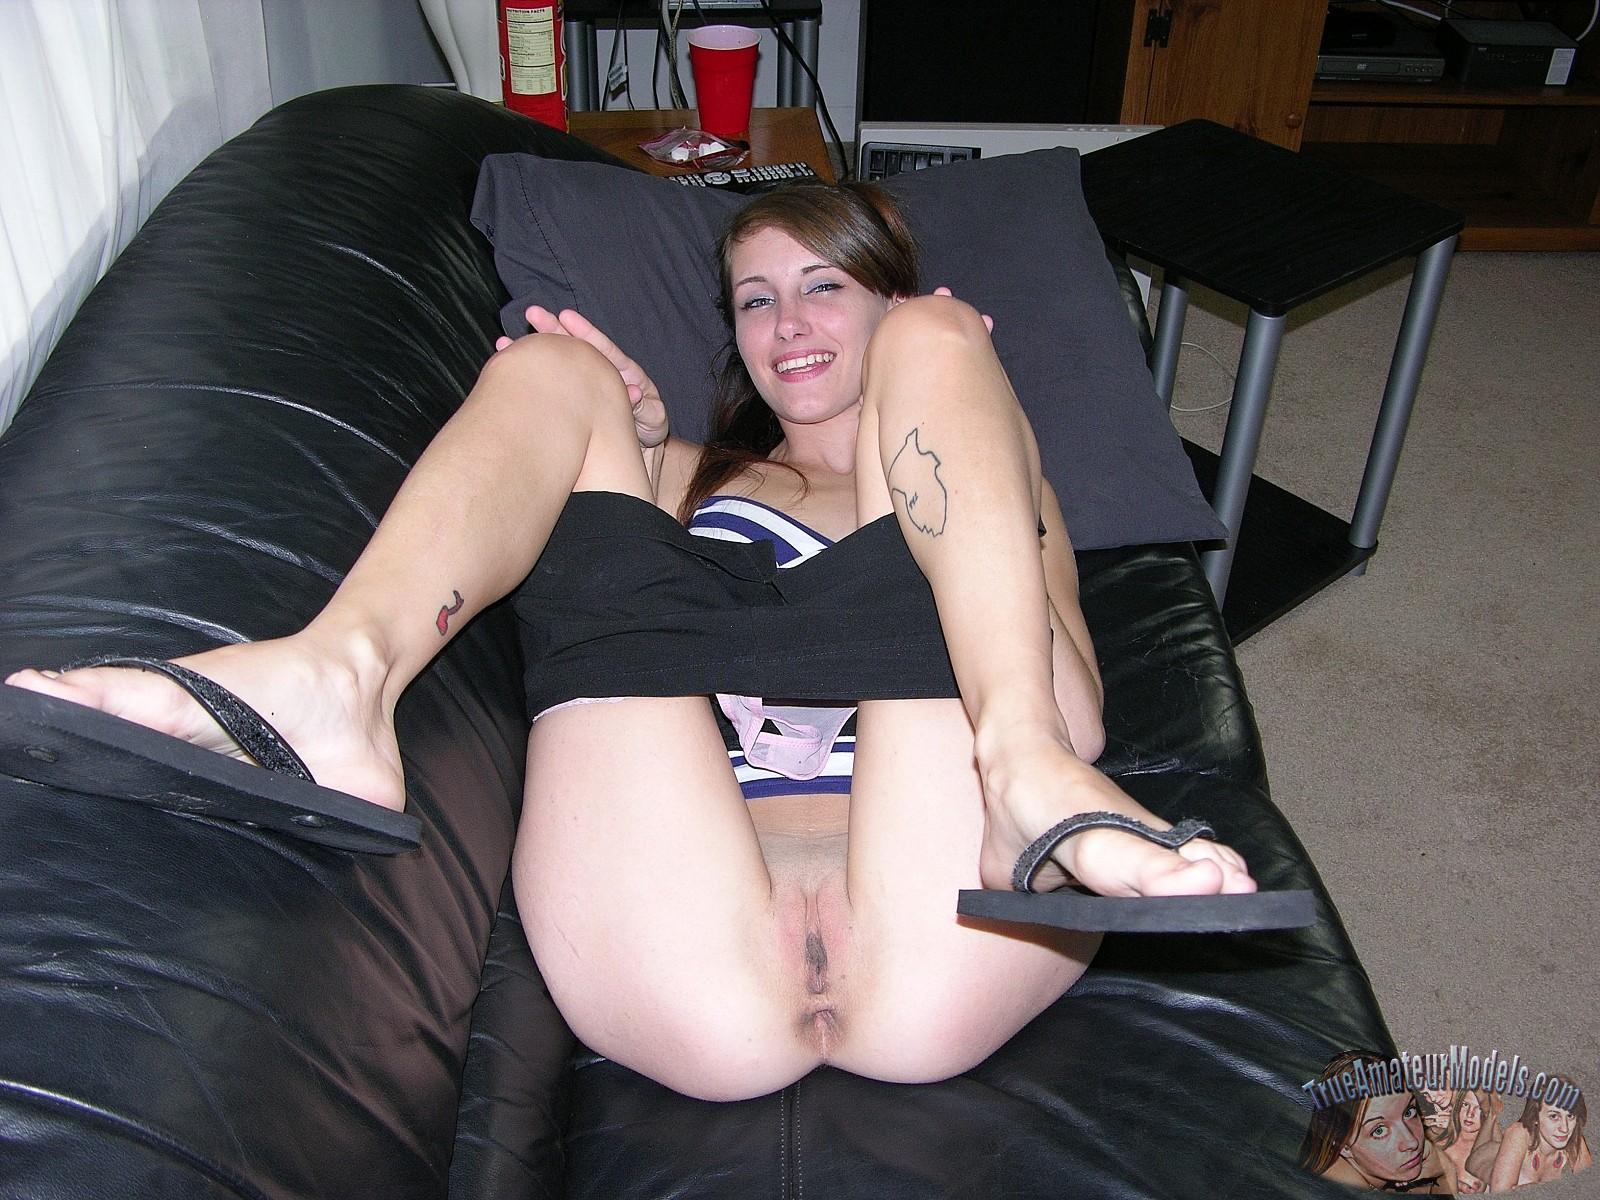 Kasi nud photo naked